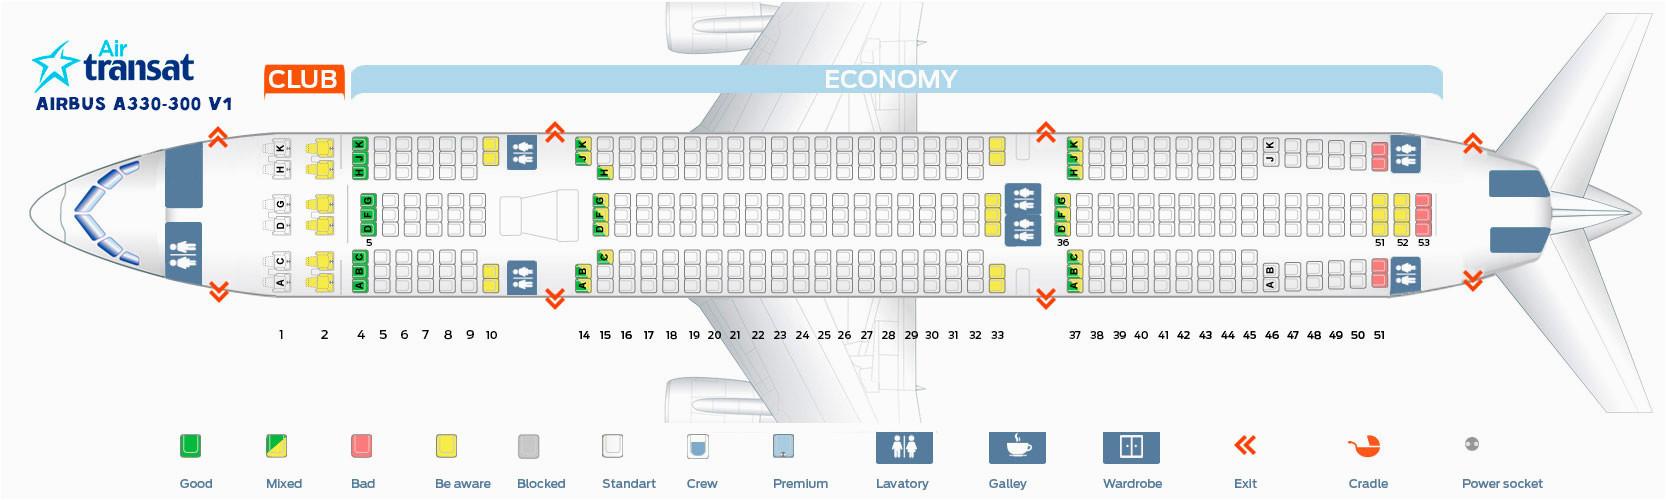 air transat a330 interior